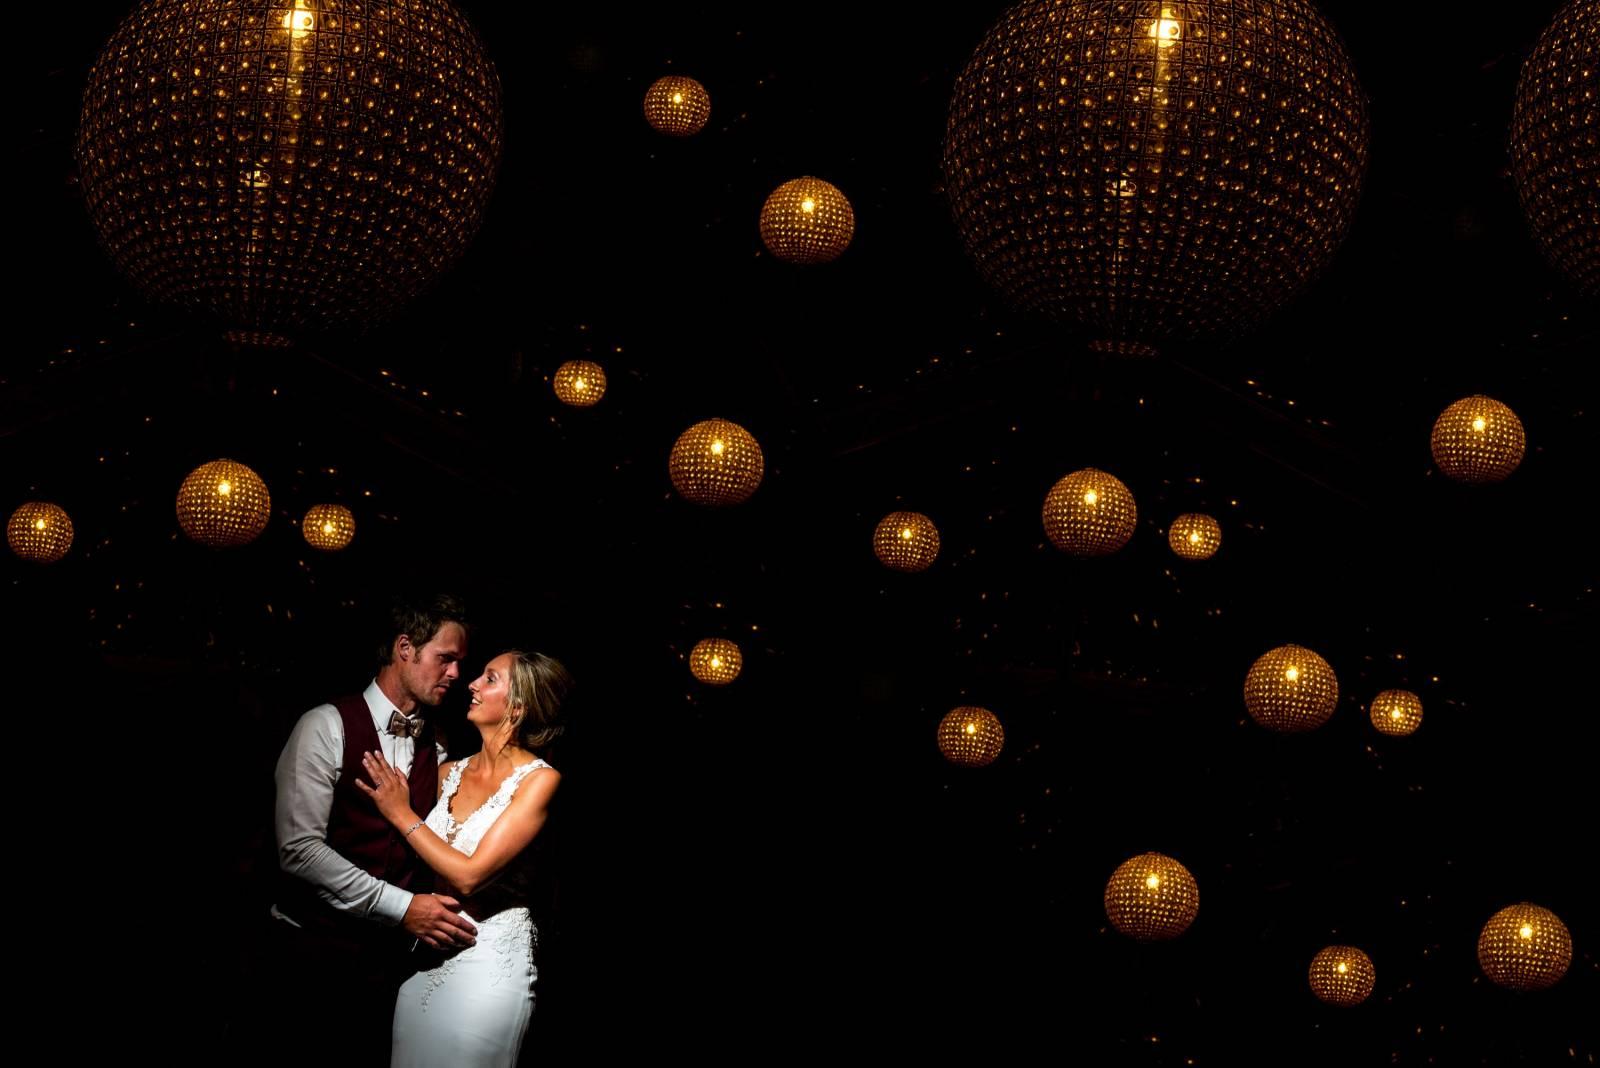 Fotografie Melody - Huwelijksfotograaf - Trouwfotograaf - House of Weddings - 16